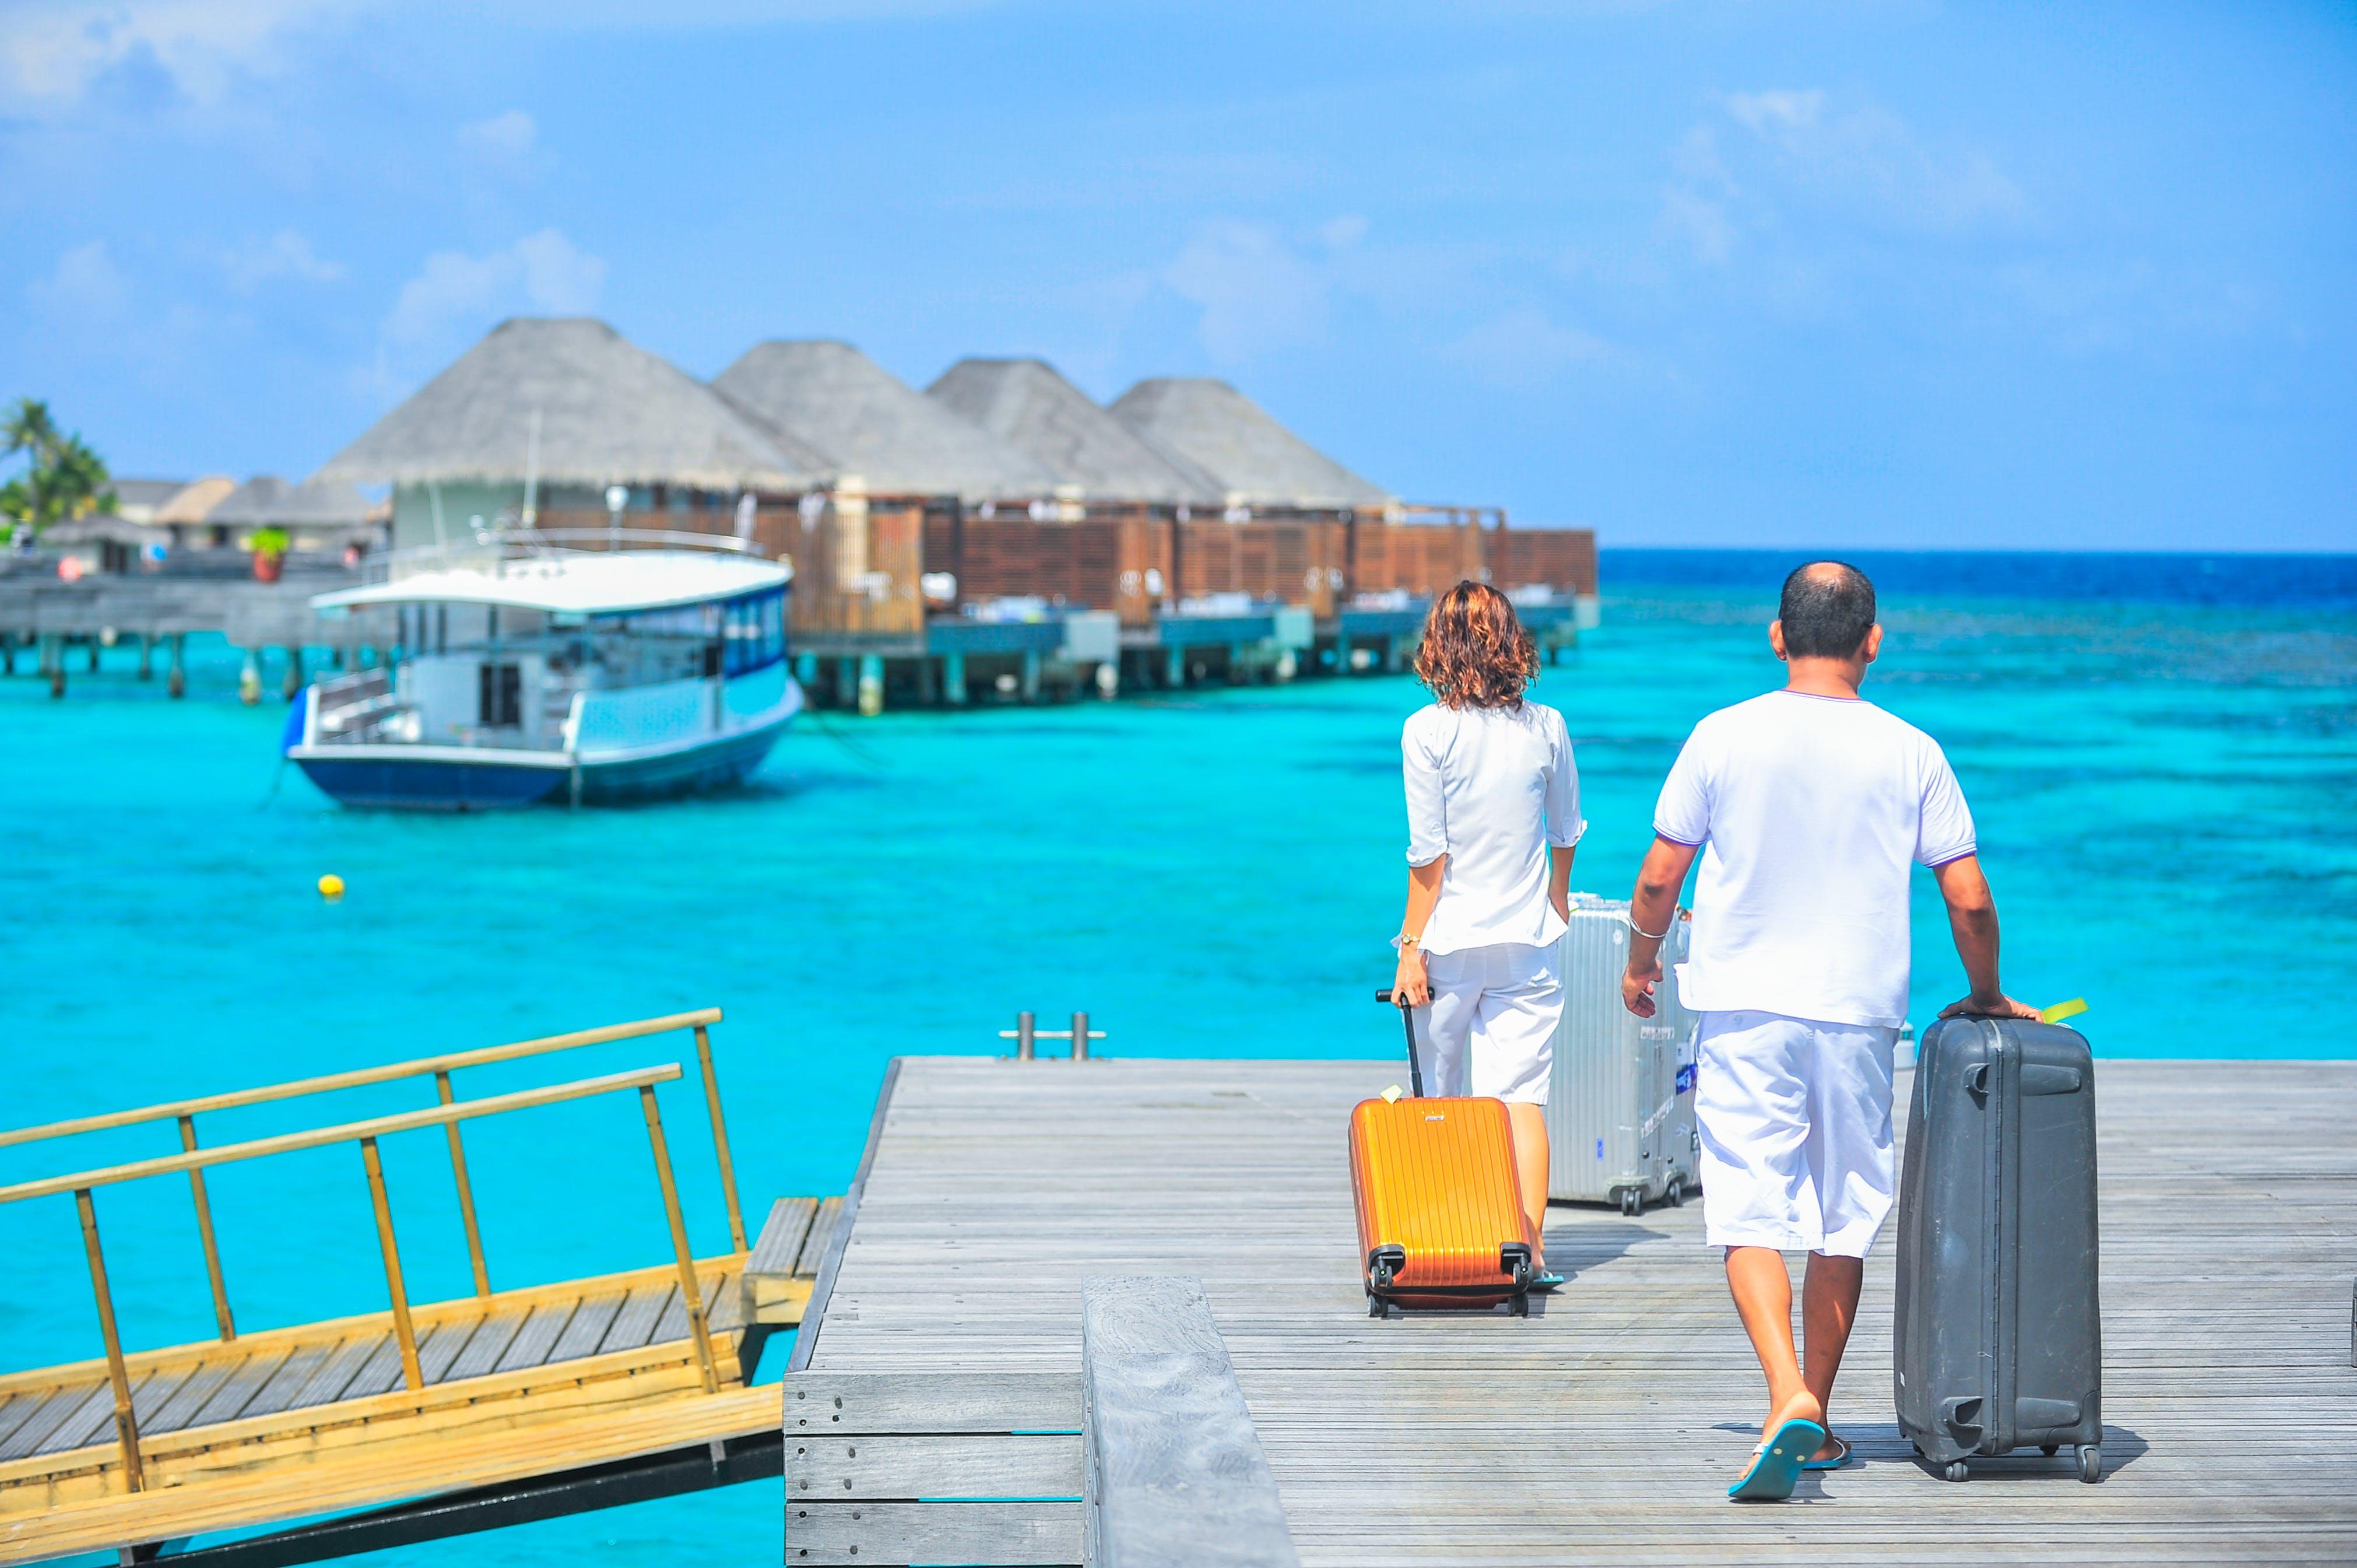 Man and Woman Walks on Dock